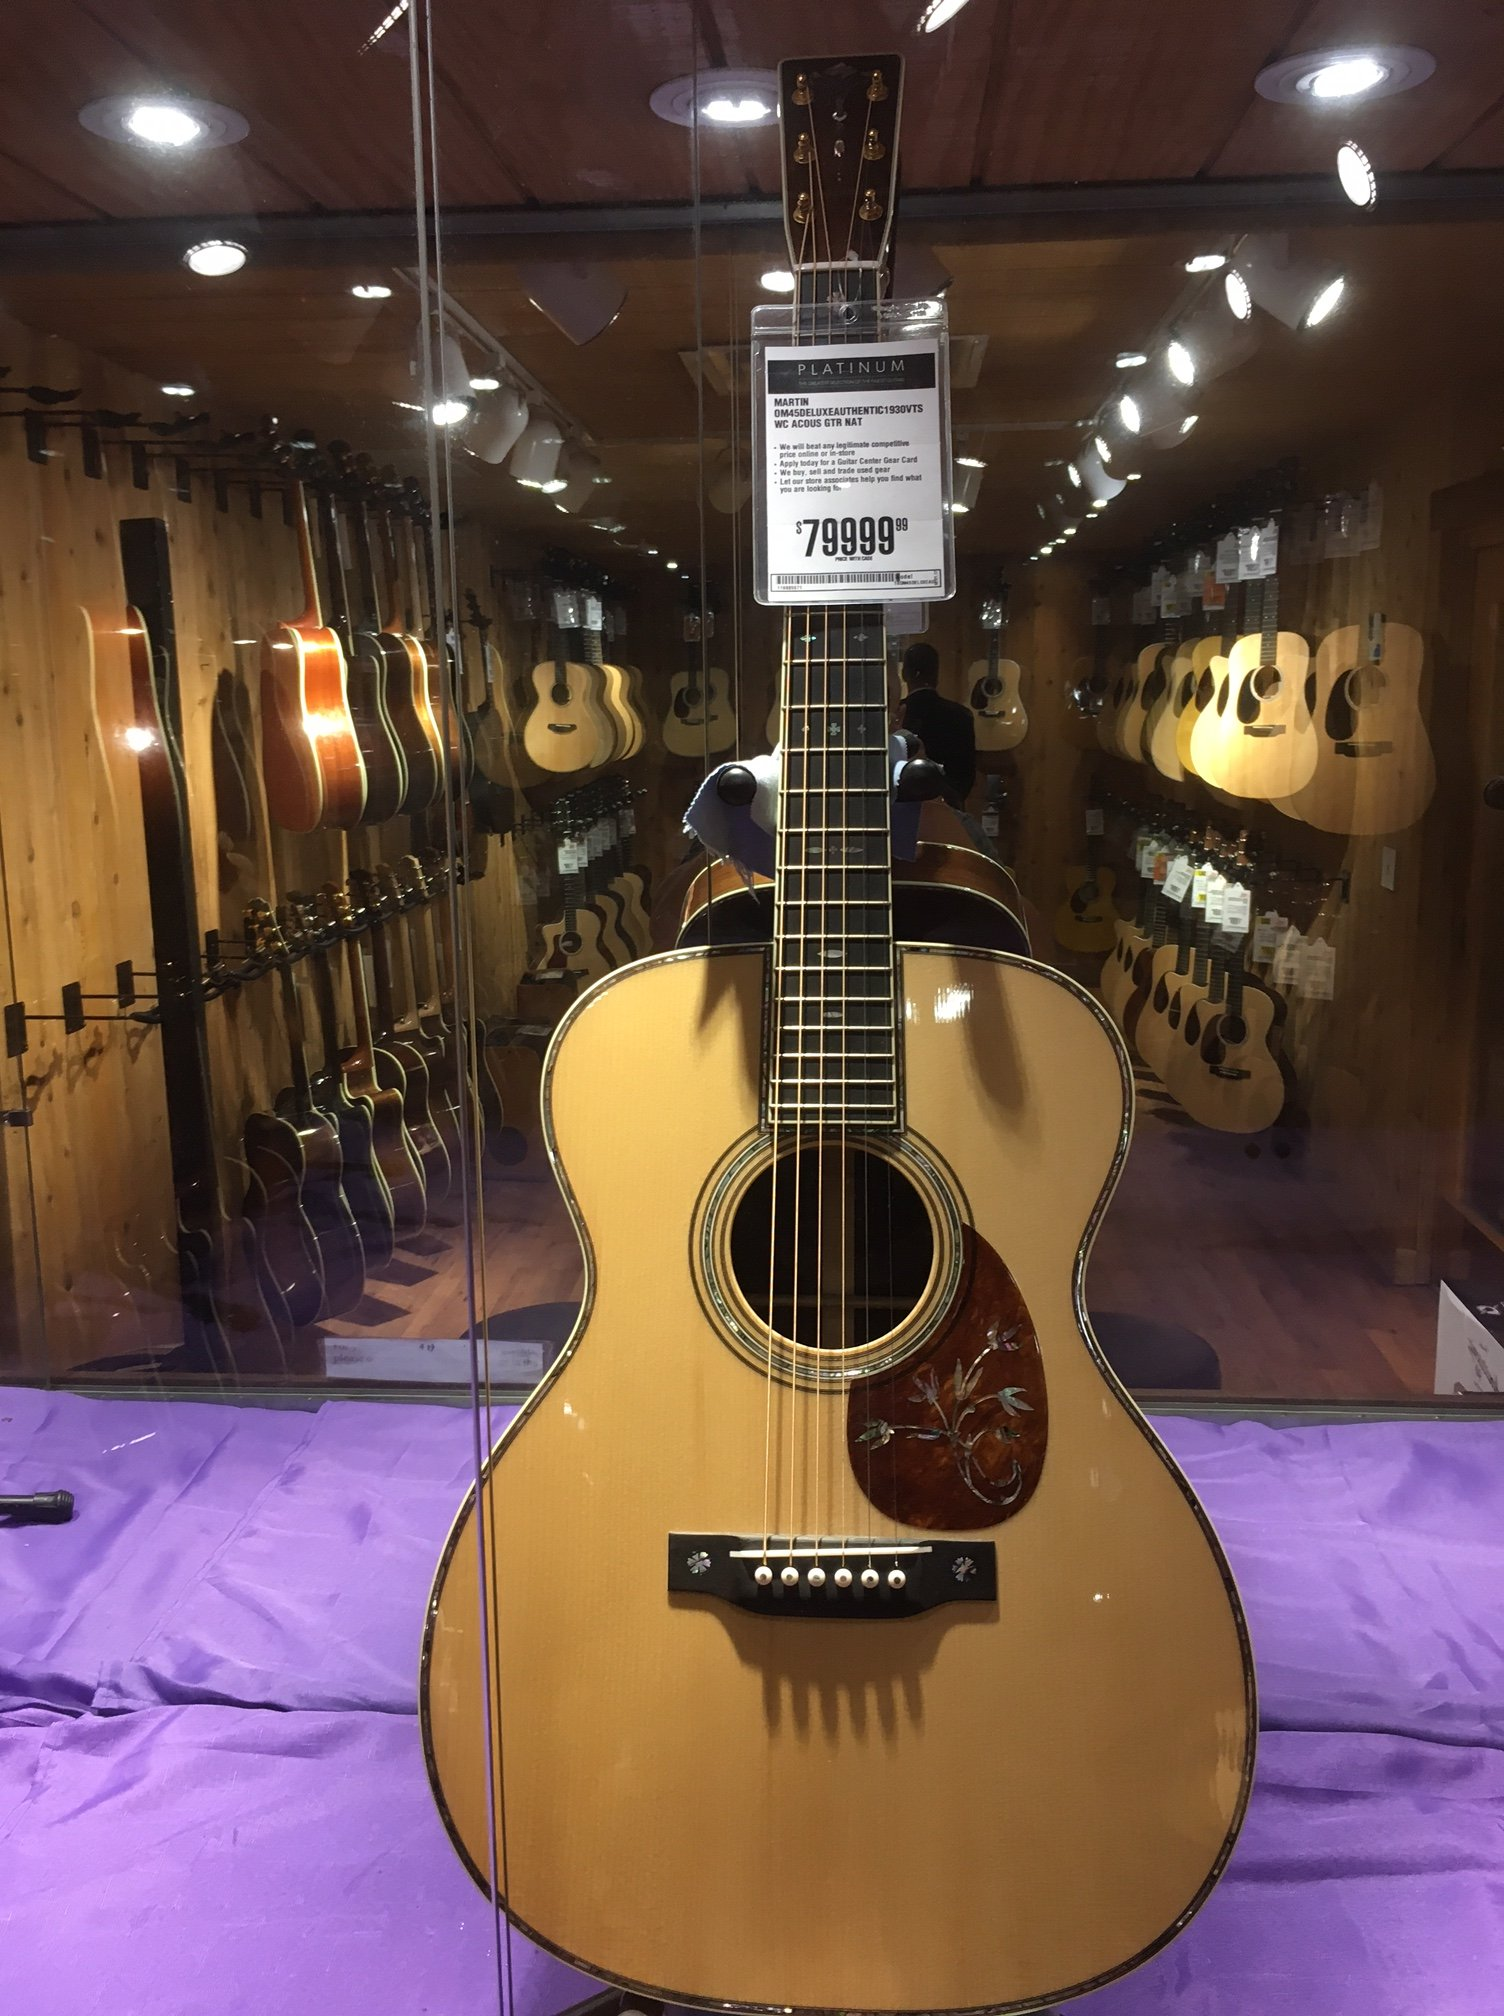 guitar center tour new york city. Black Bedroom Furniture Sets. Home Design Ideas